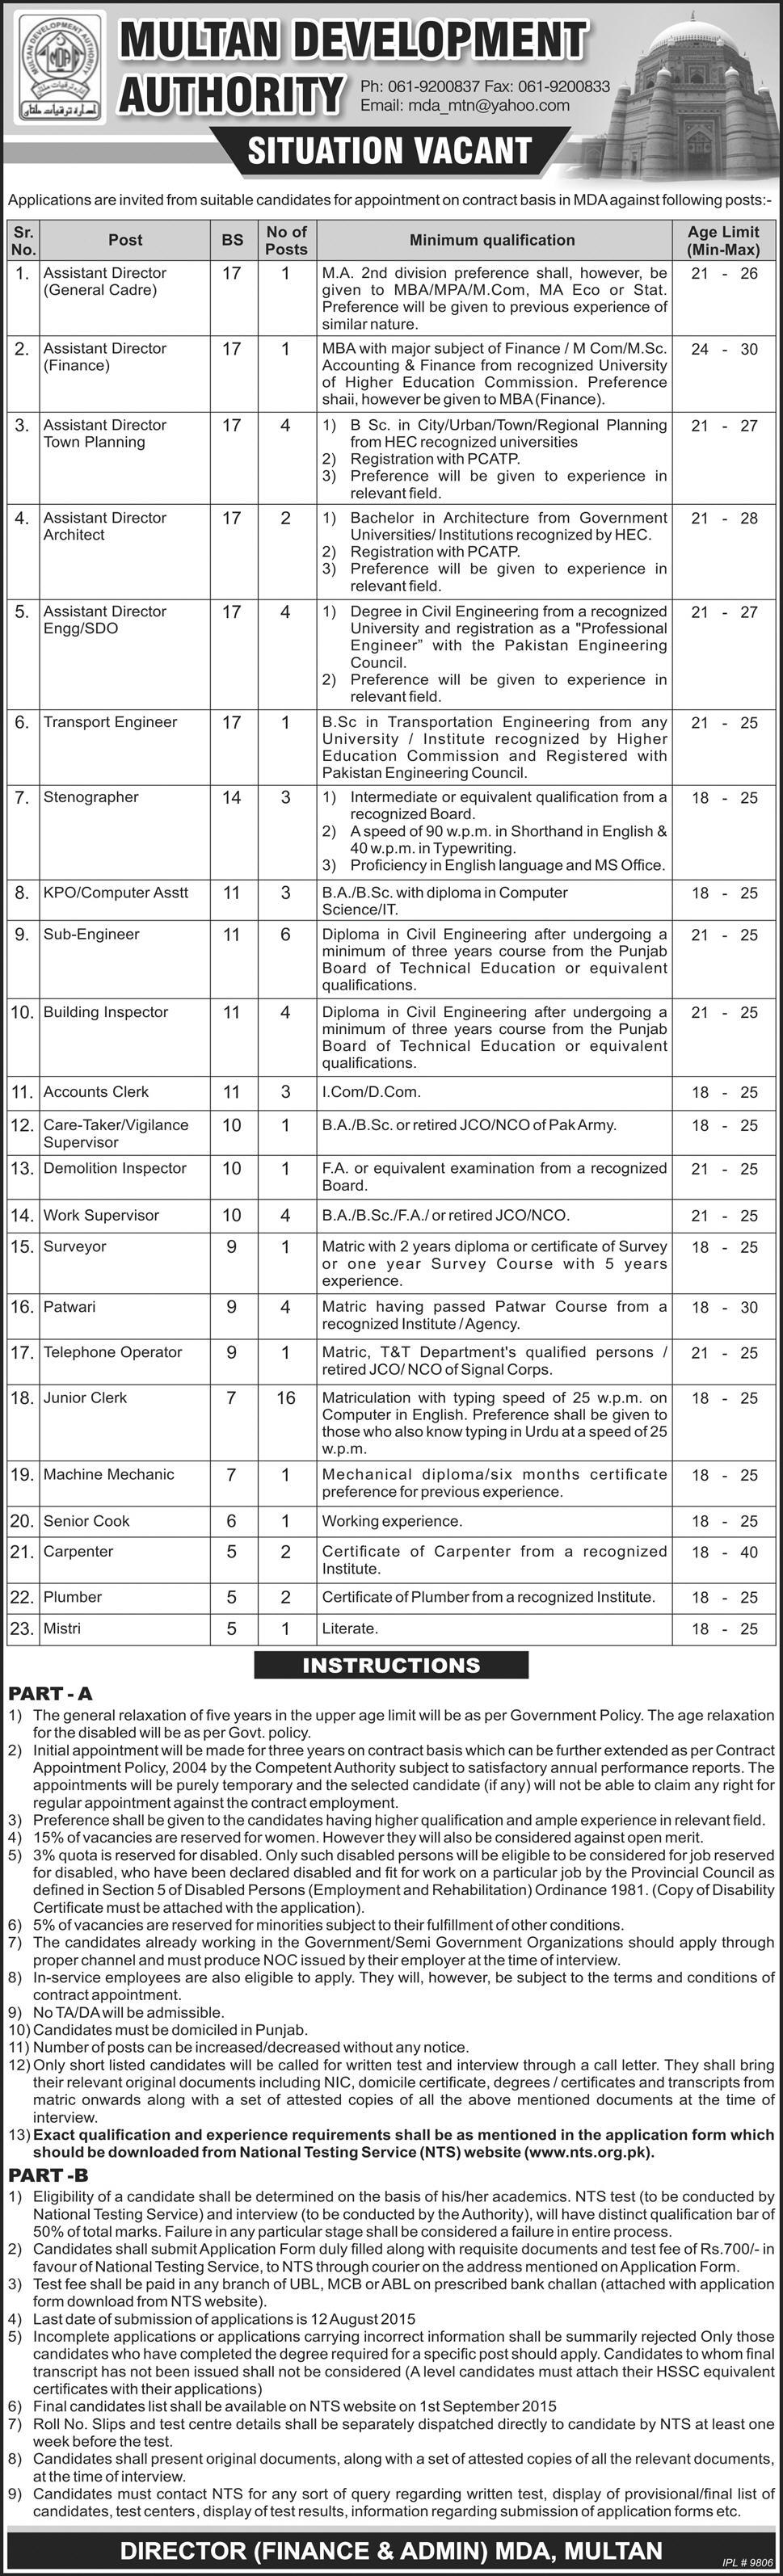 Multan Development Authority MDA Jobs 2015 NTS Form